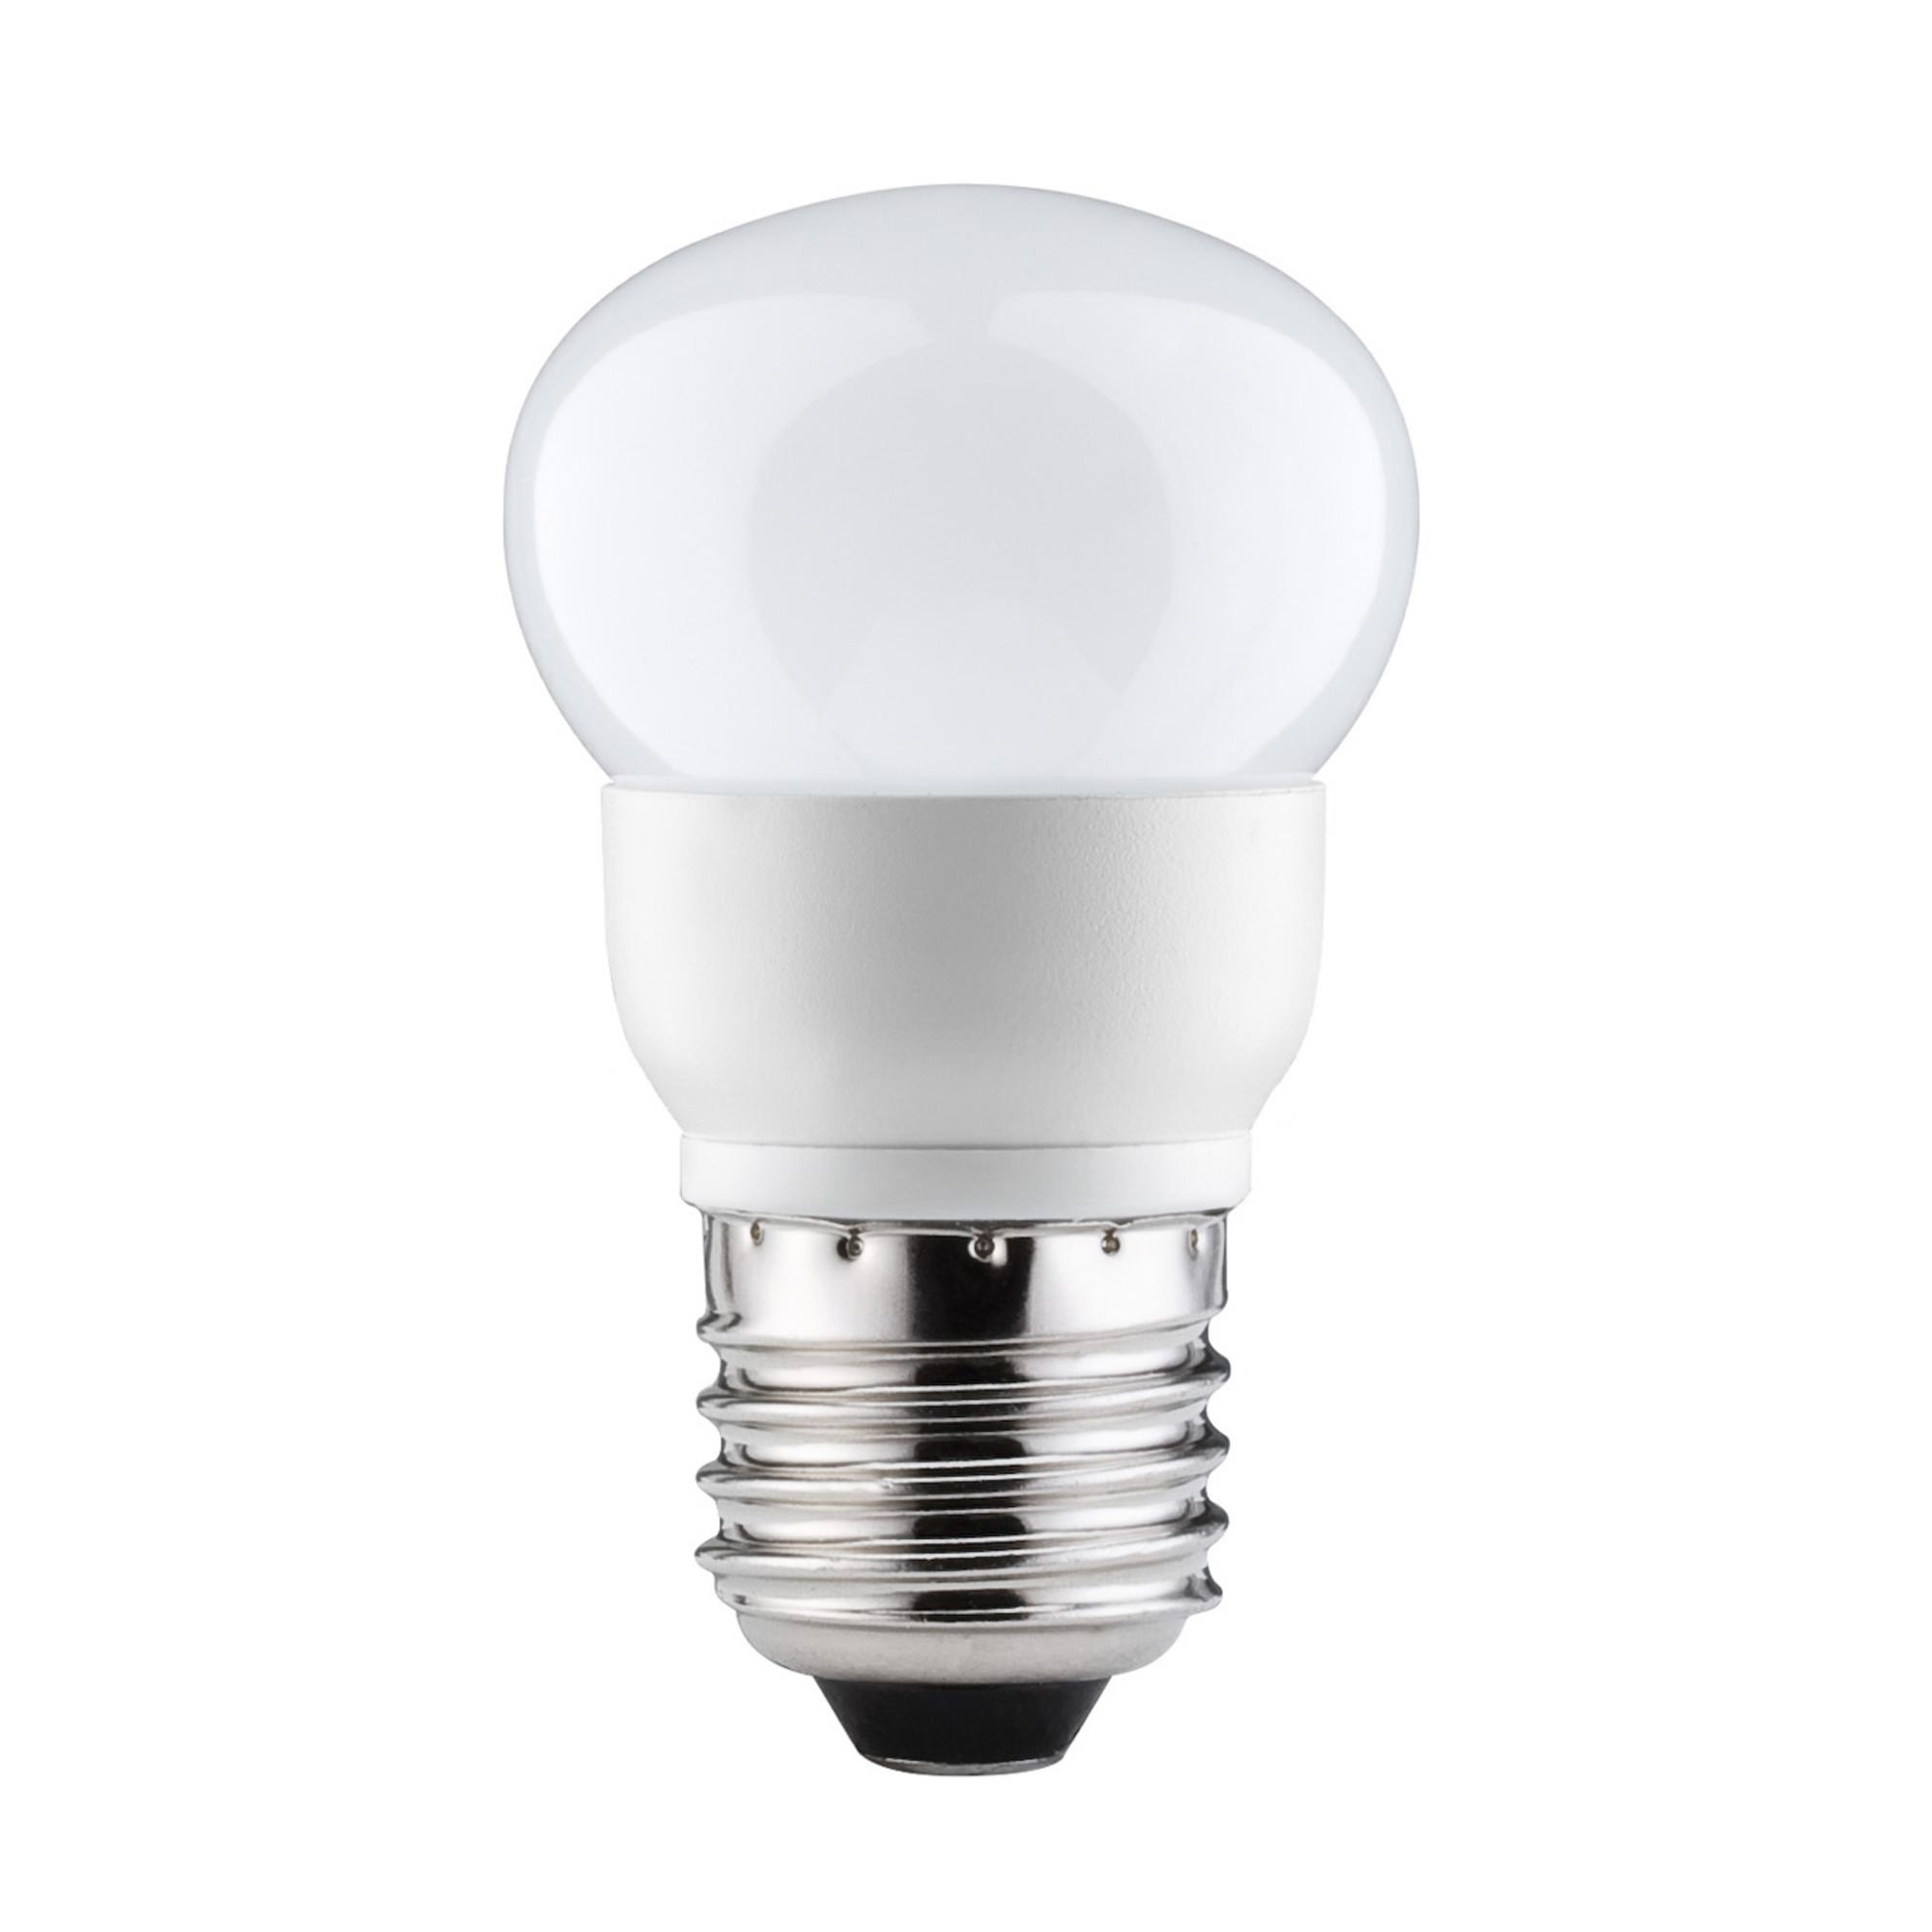 Лампа светодиодная Paulmann 28241 E27 250 Лм теплый свет